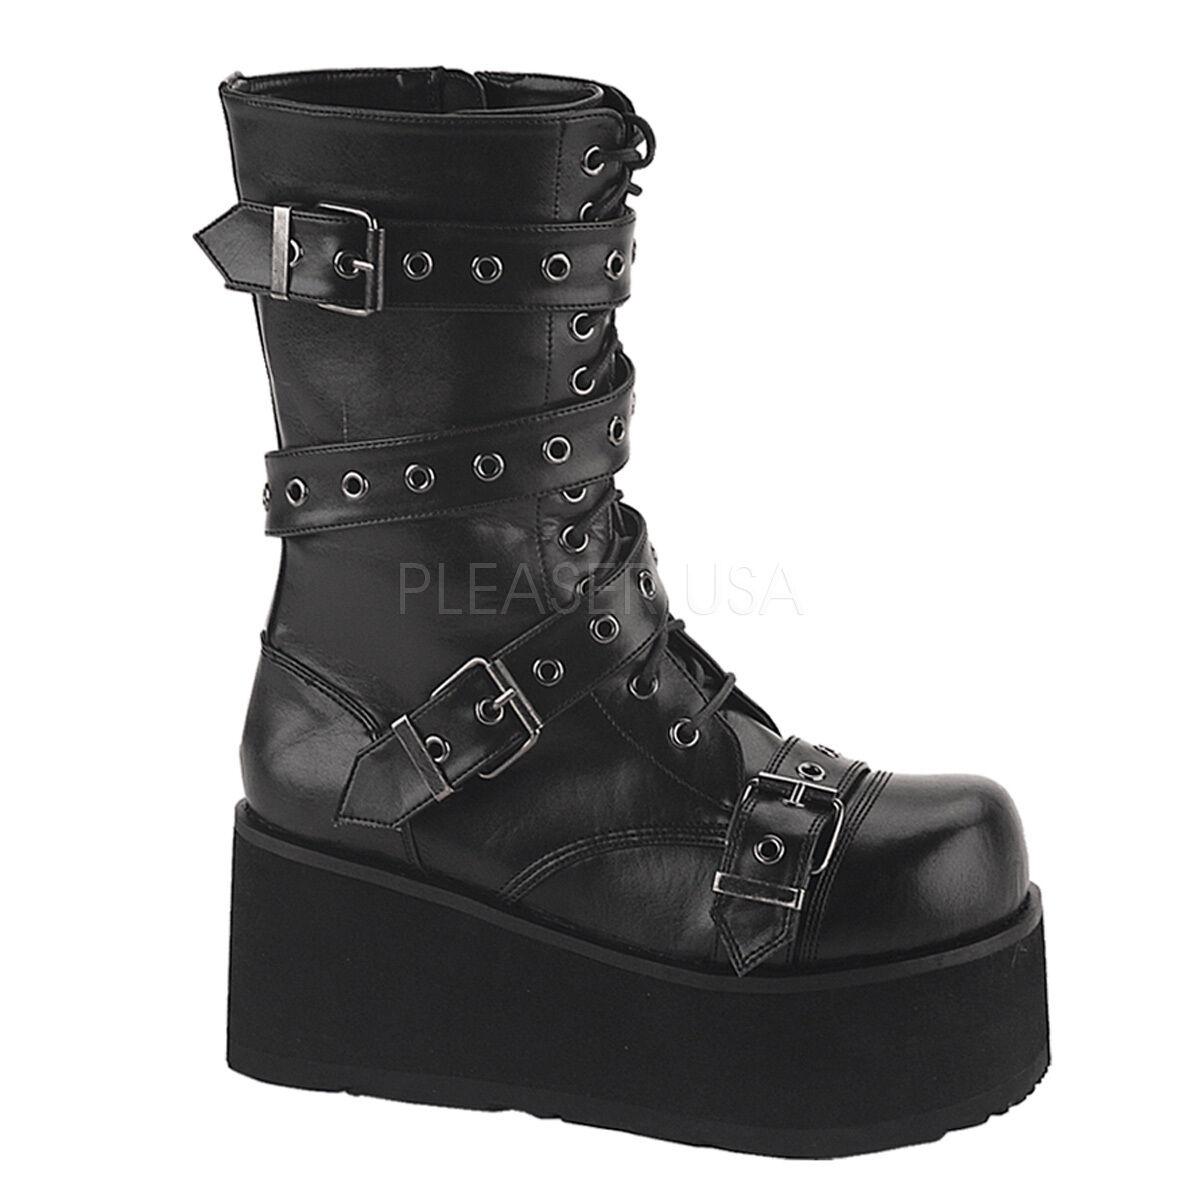 DEMONIA TRA205/B/PU Women's Gothic Gothic Women's Punk Black Platform Ankle Boots Wrap Strap 7e7cae